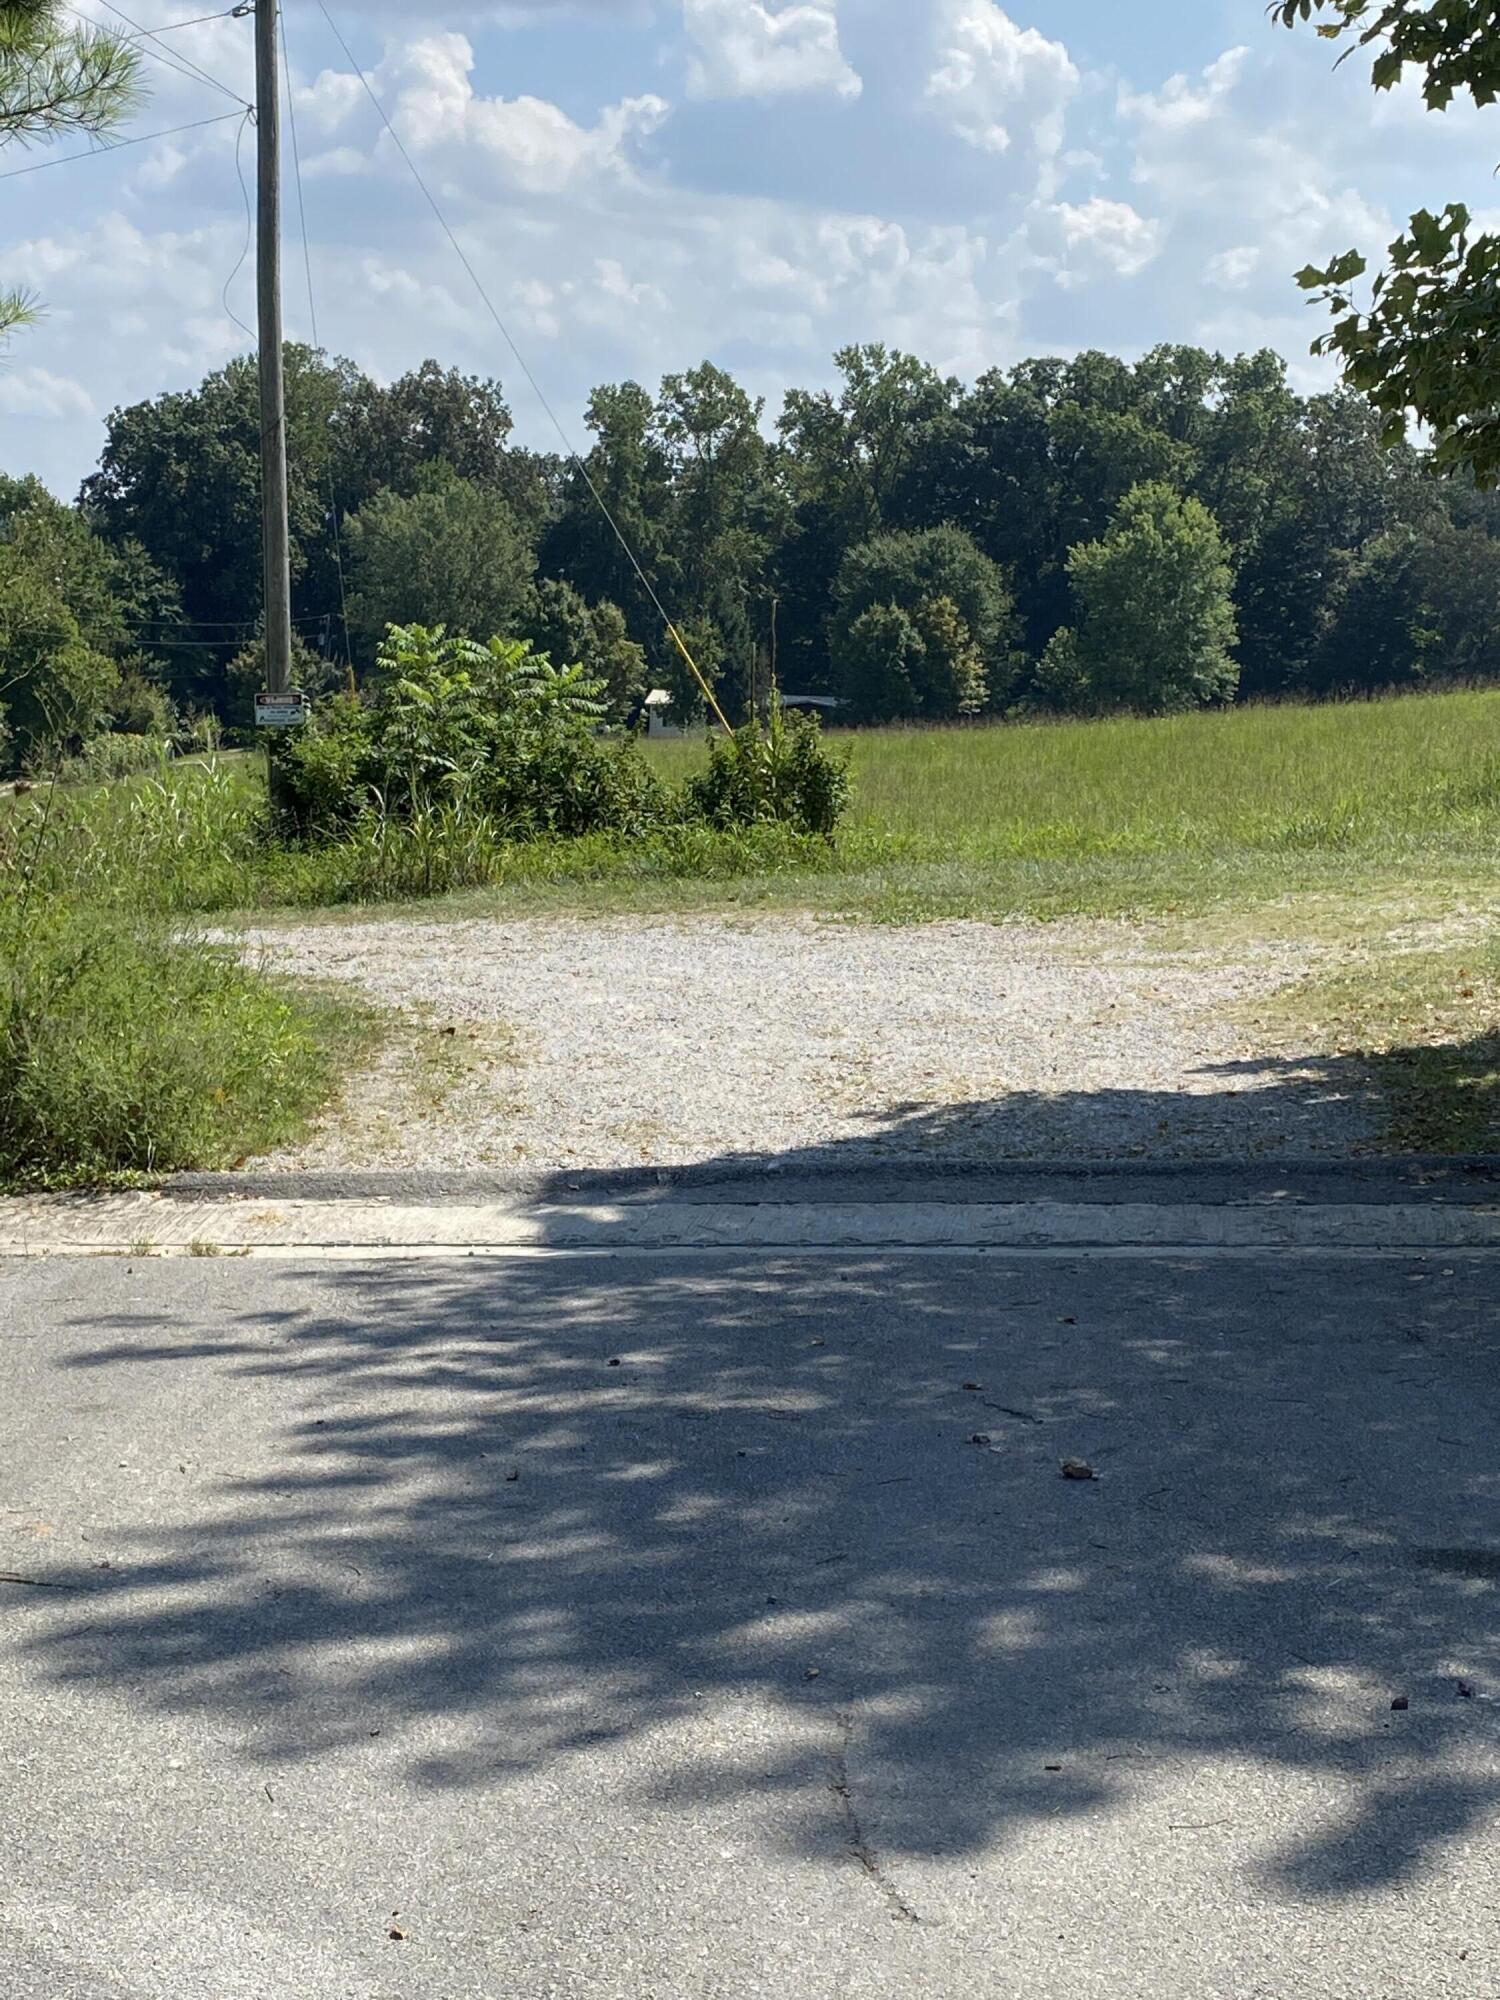 197 Farahs Way, Science Hill, KY 42553